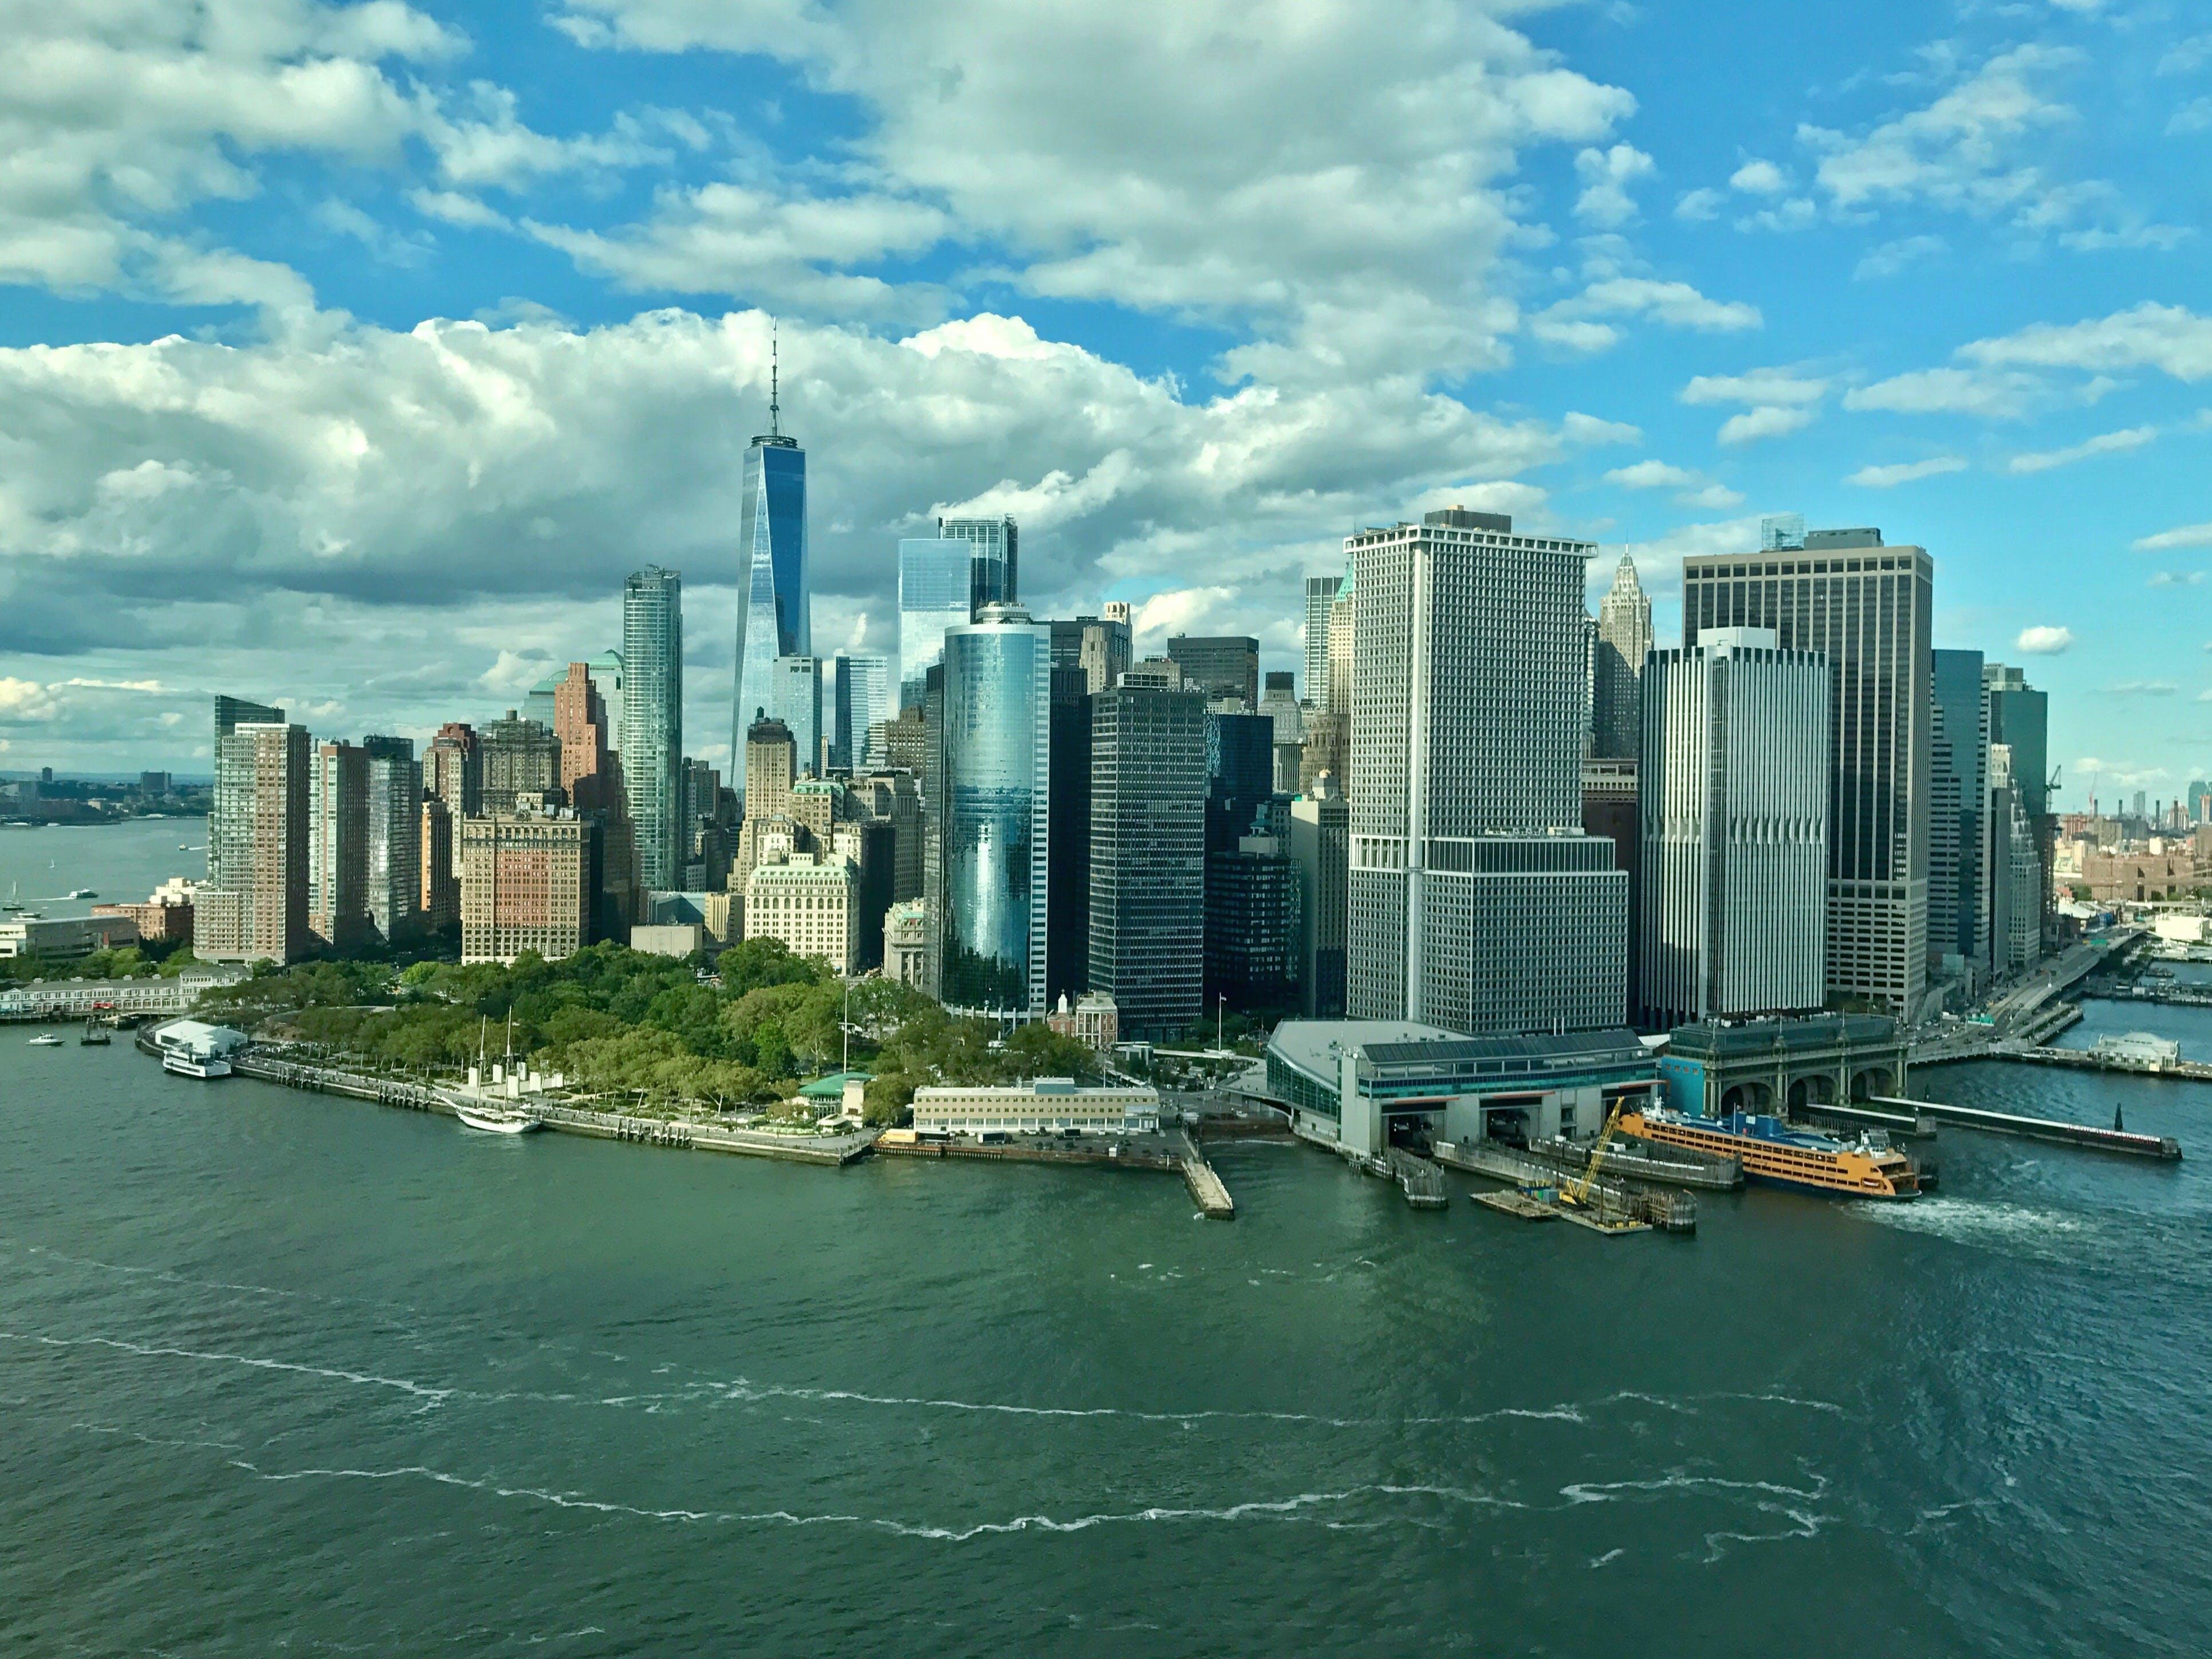 Free stock photo of united states of america, new york city, lower manhattan, Downtown Manhattan